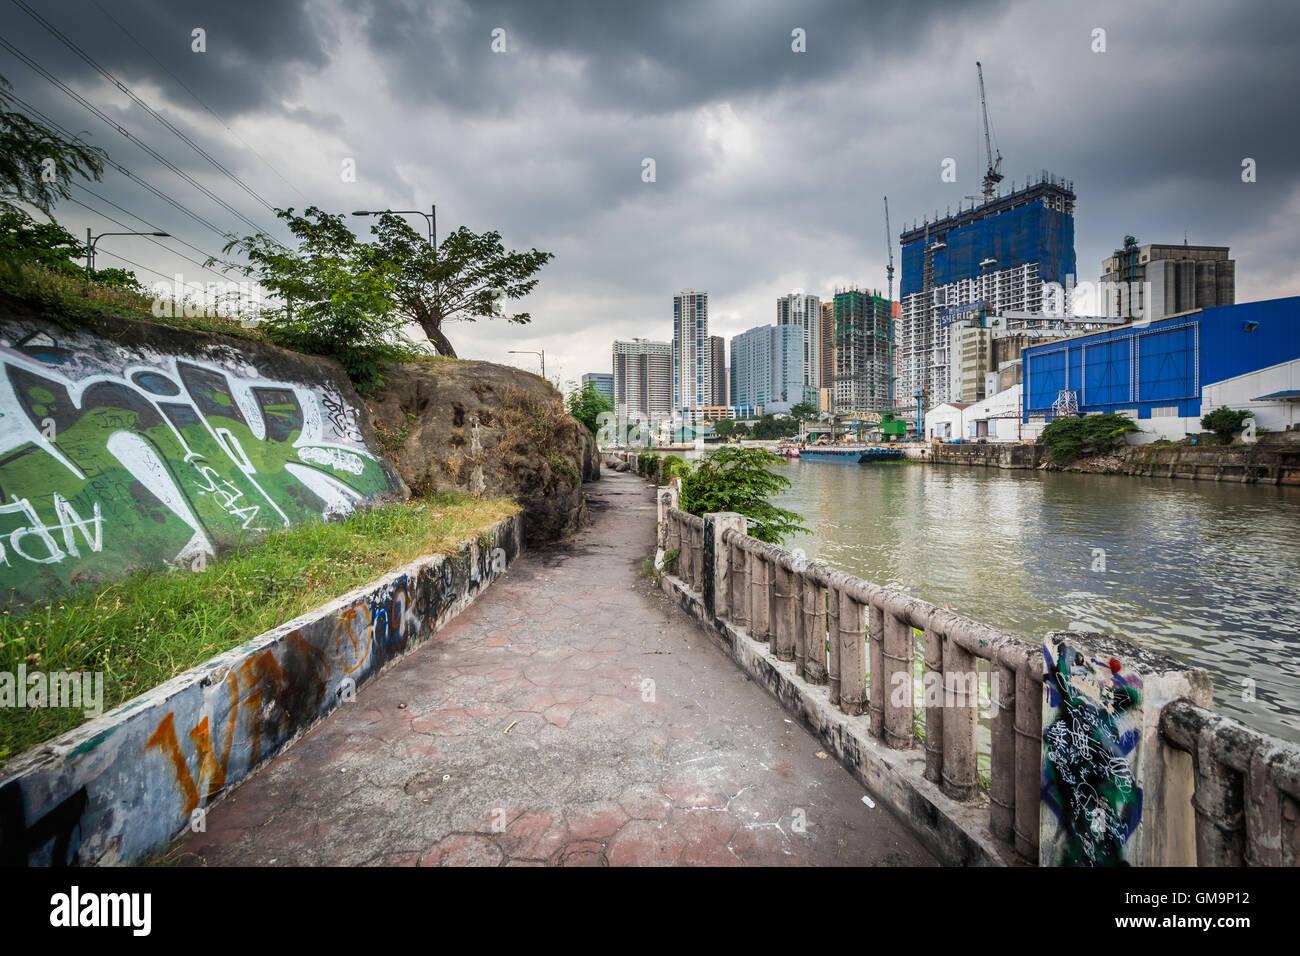 The Pasig River in Makati, Metro Manila, The Philippines. - Stock Image